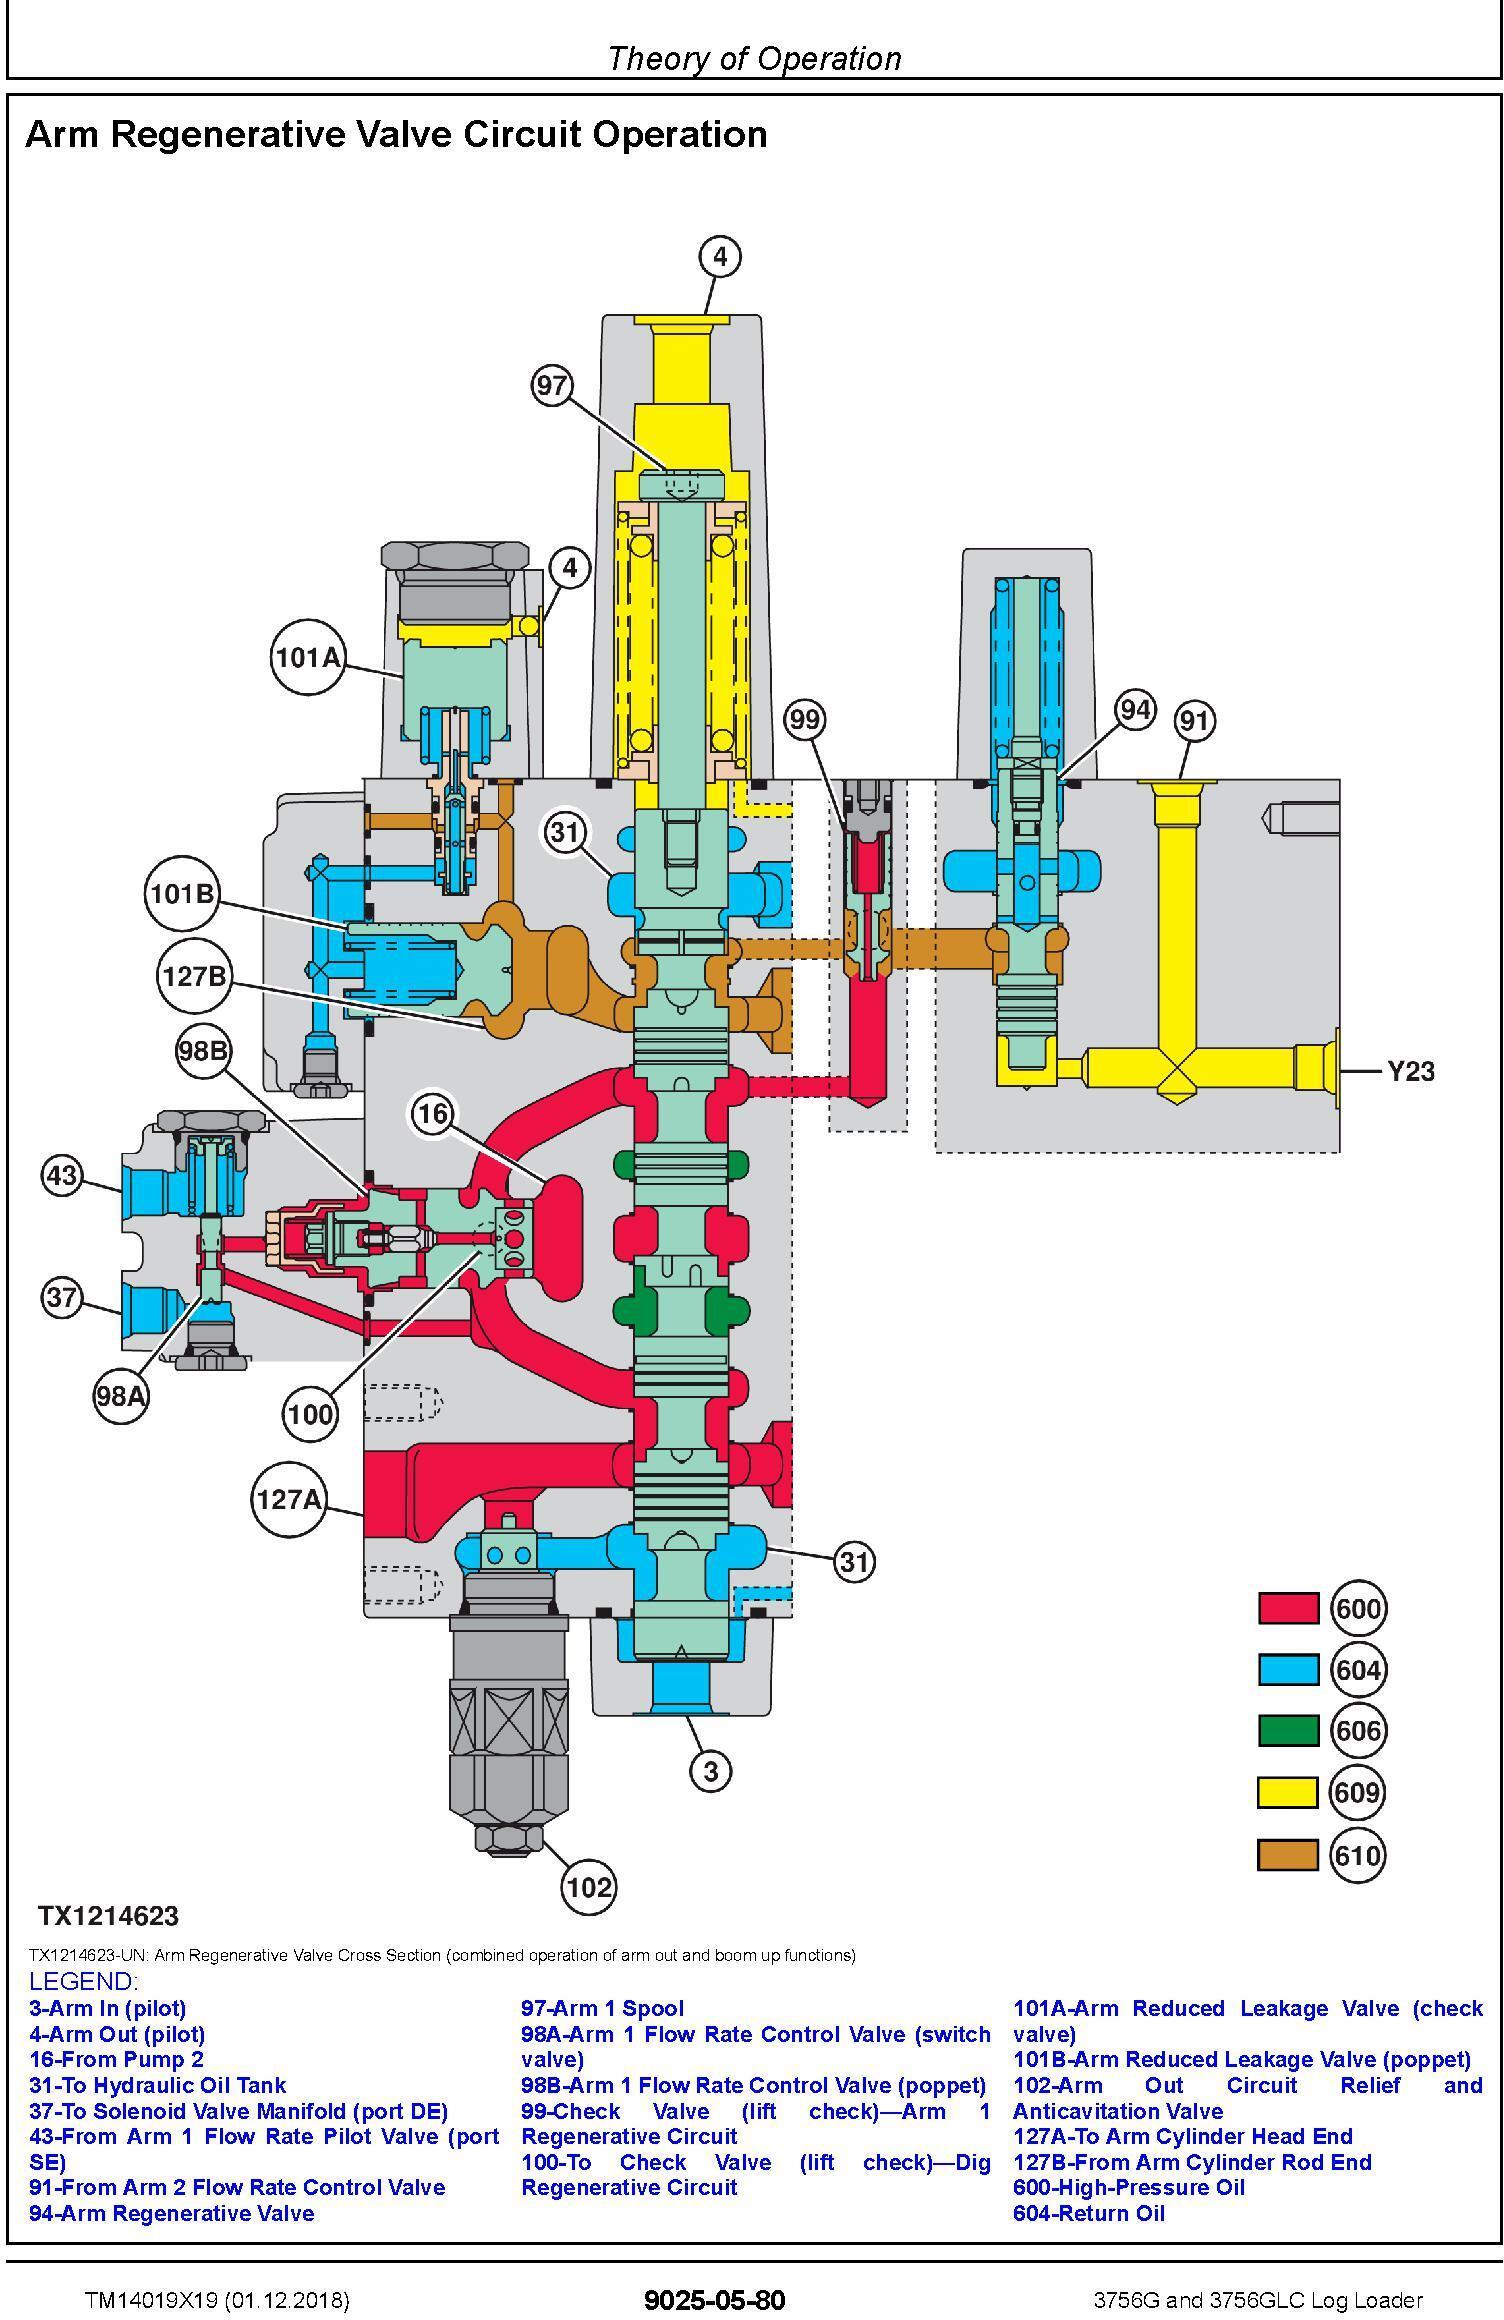 John Deere 3756G, 3756GLC (SN. D376001-) Log Loader Operation & Test Technical Manual (TM14019X19) - 2